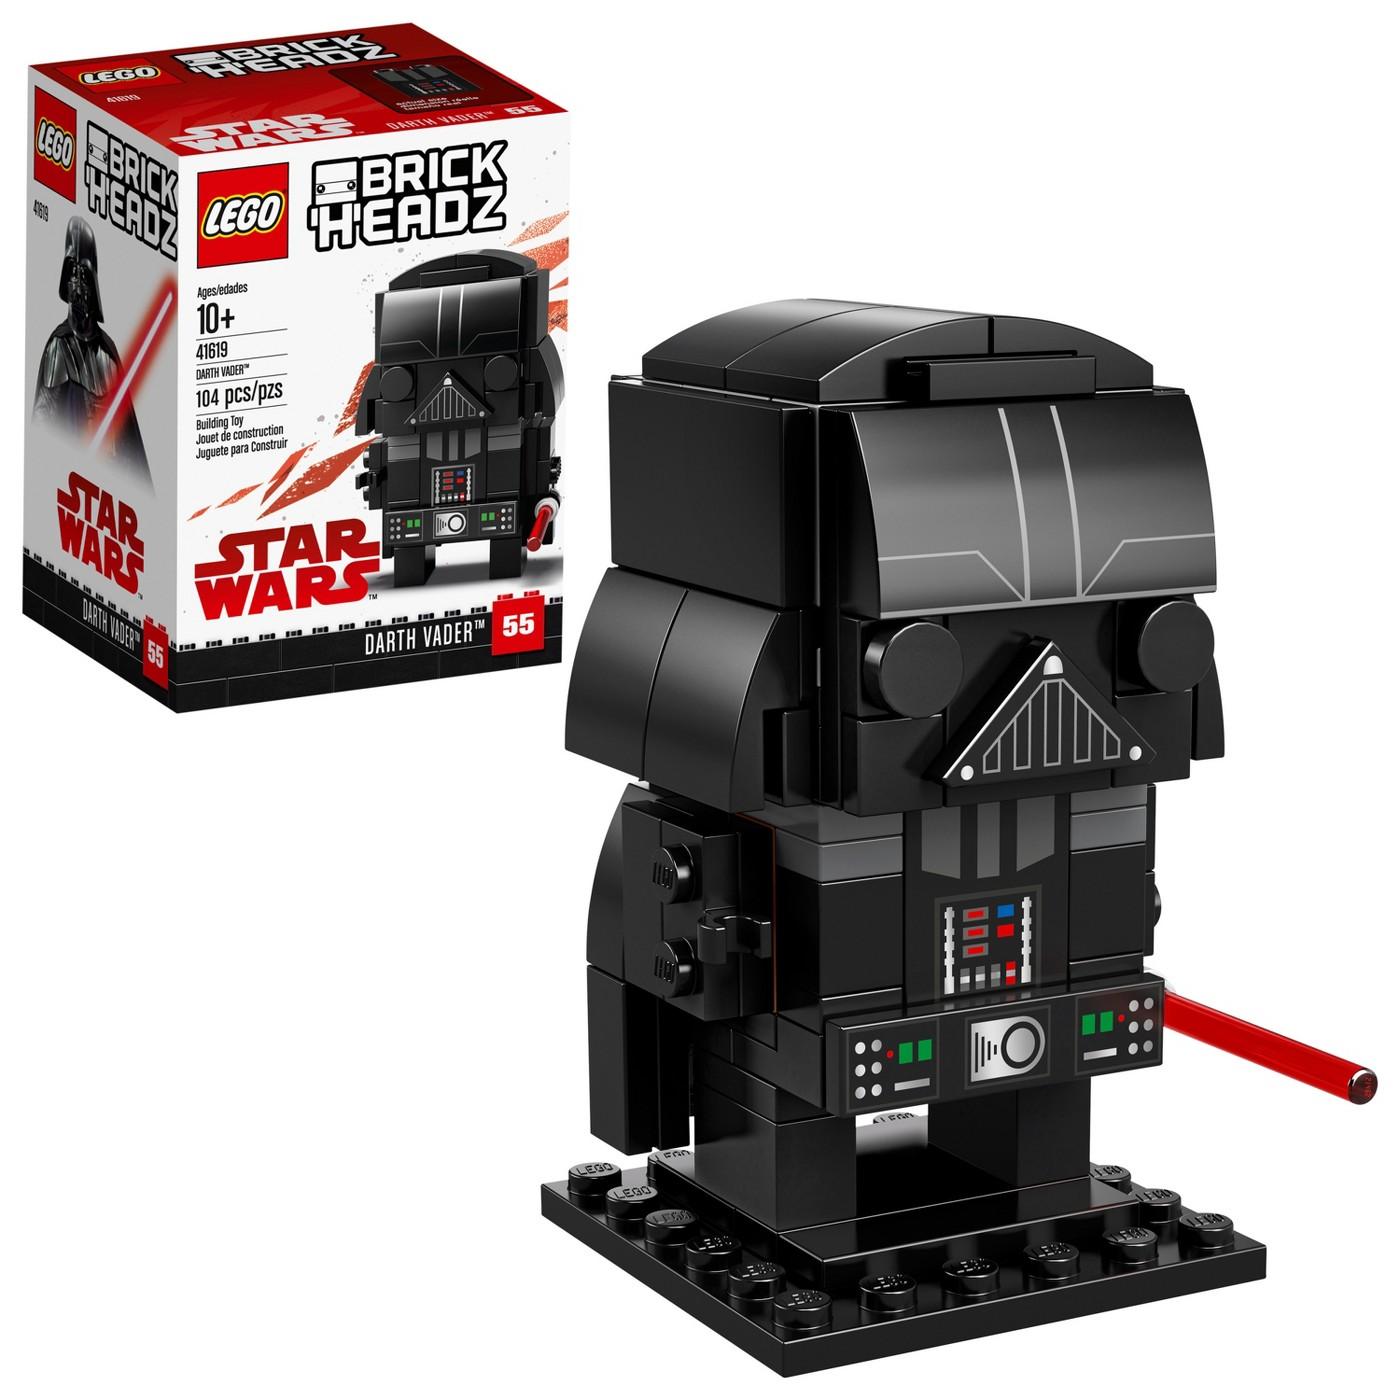 LEGO BrickHeadz Star Wars Darth Vader 41619 - image 1 of 6